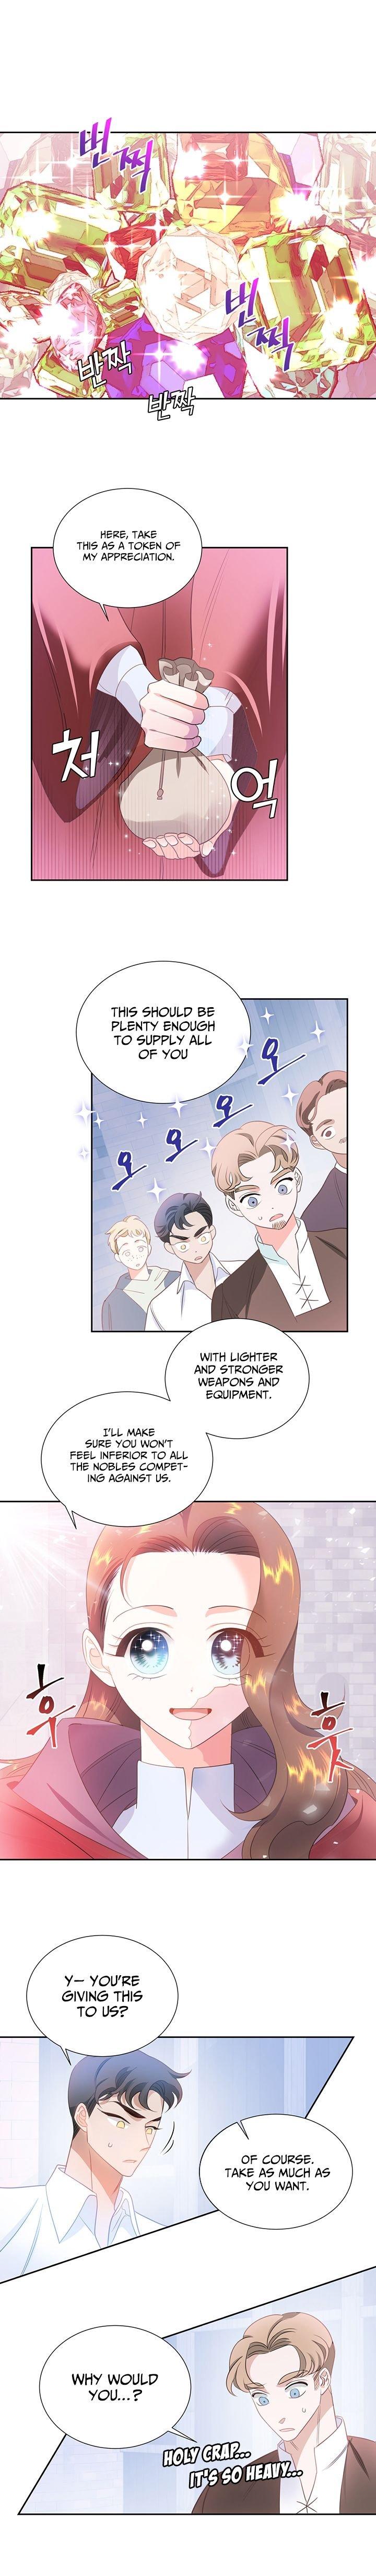 Manga The Princess' Spaceship - Chapter 20 Page 1